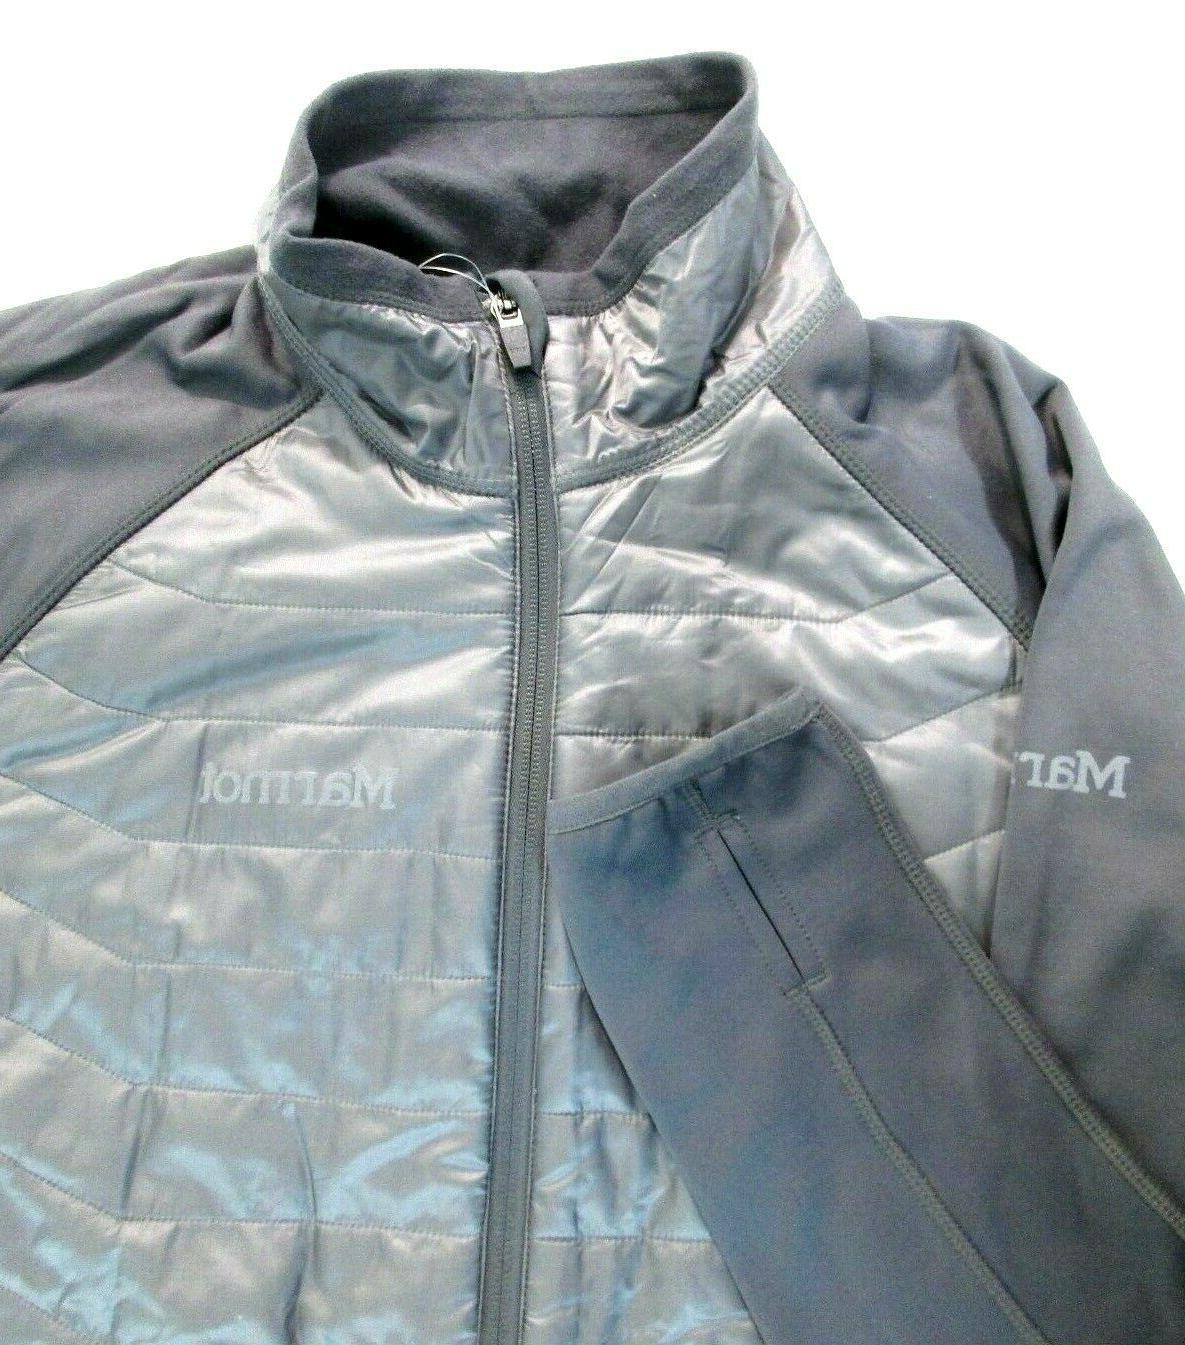 Marmot Coat 84700 1453